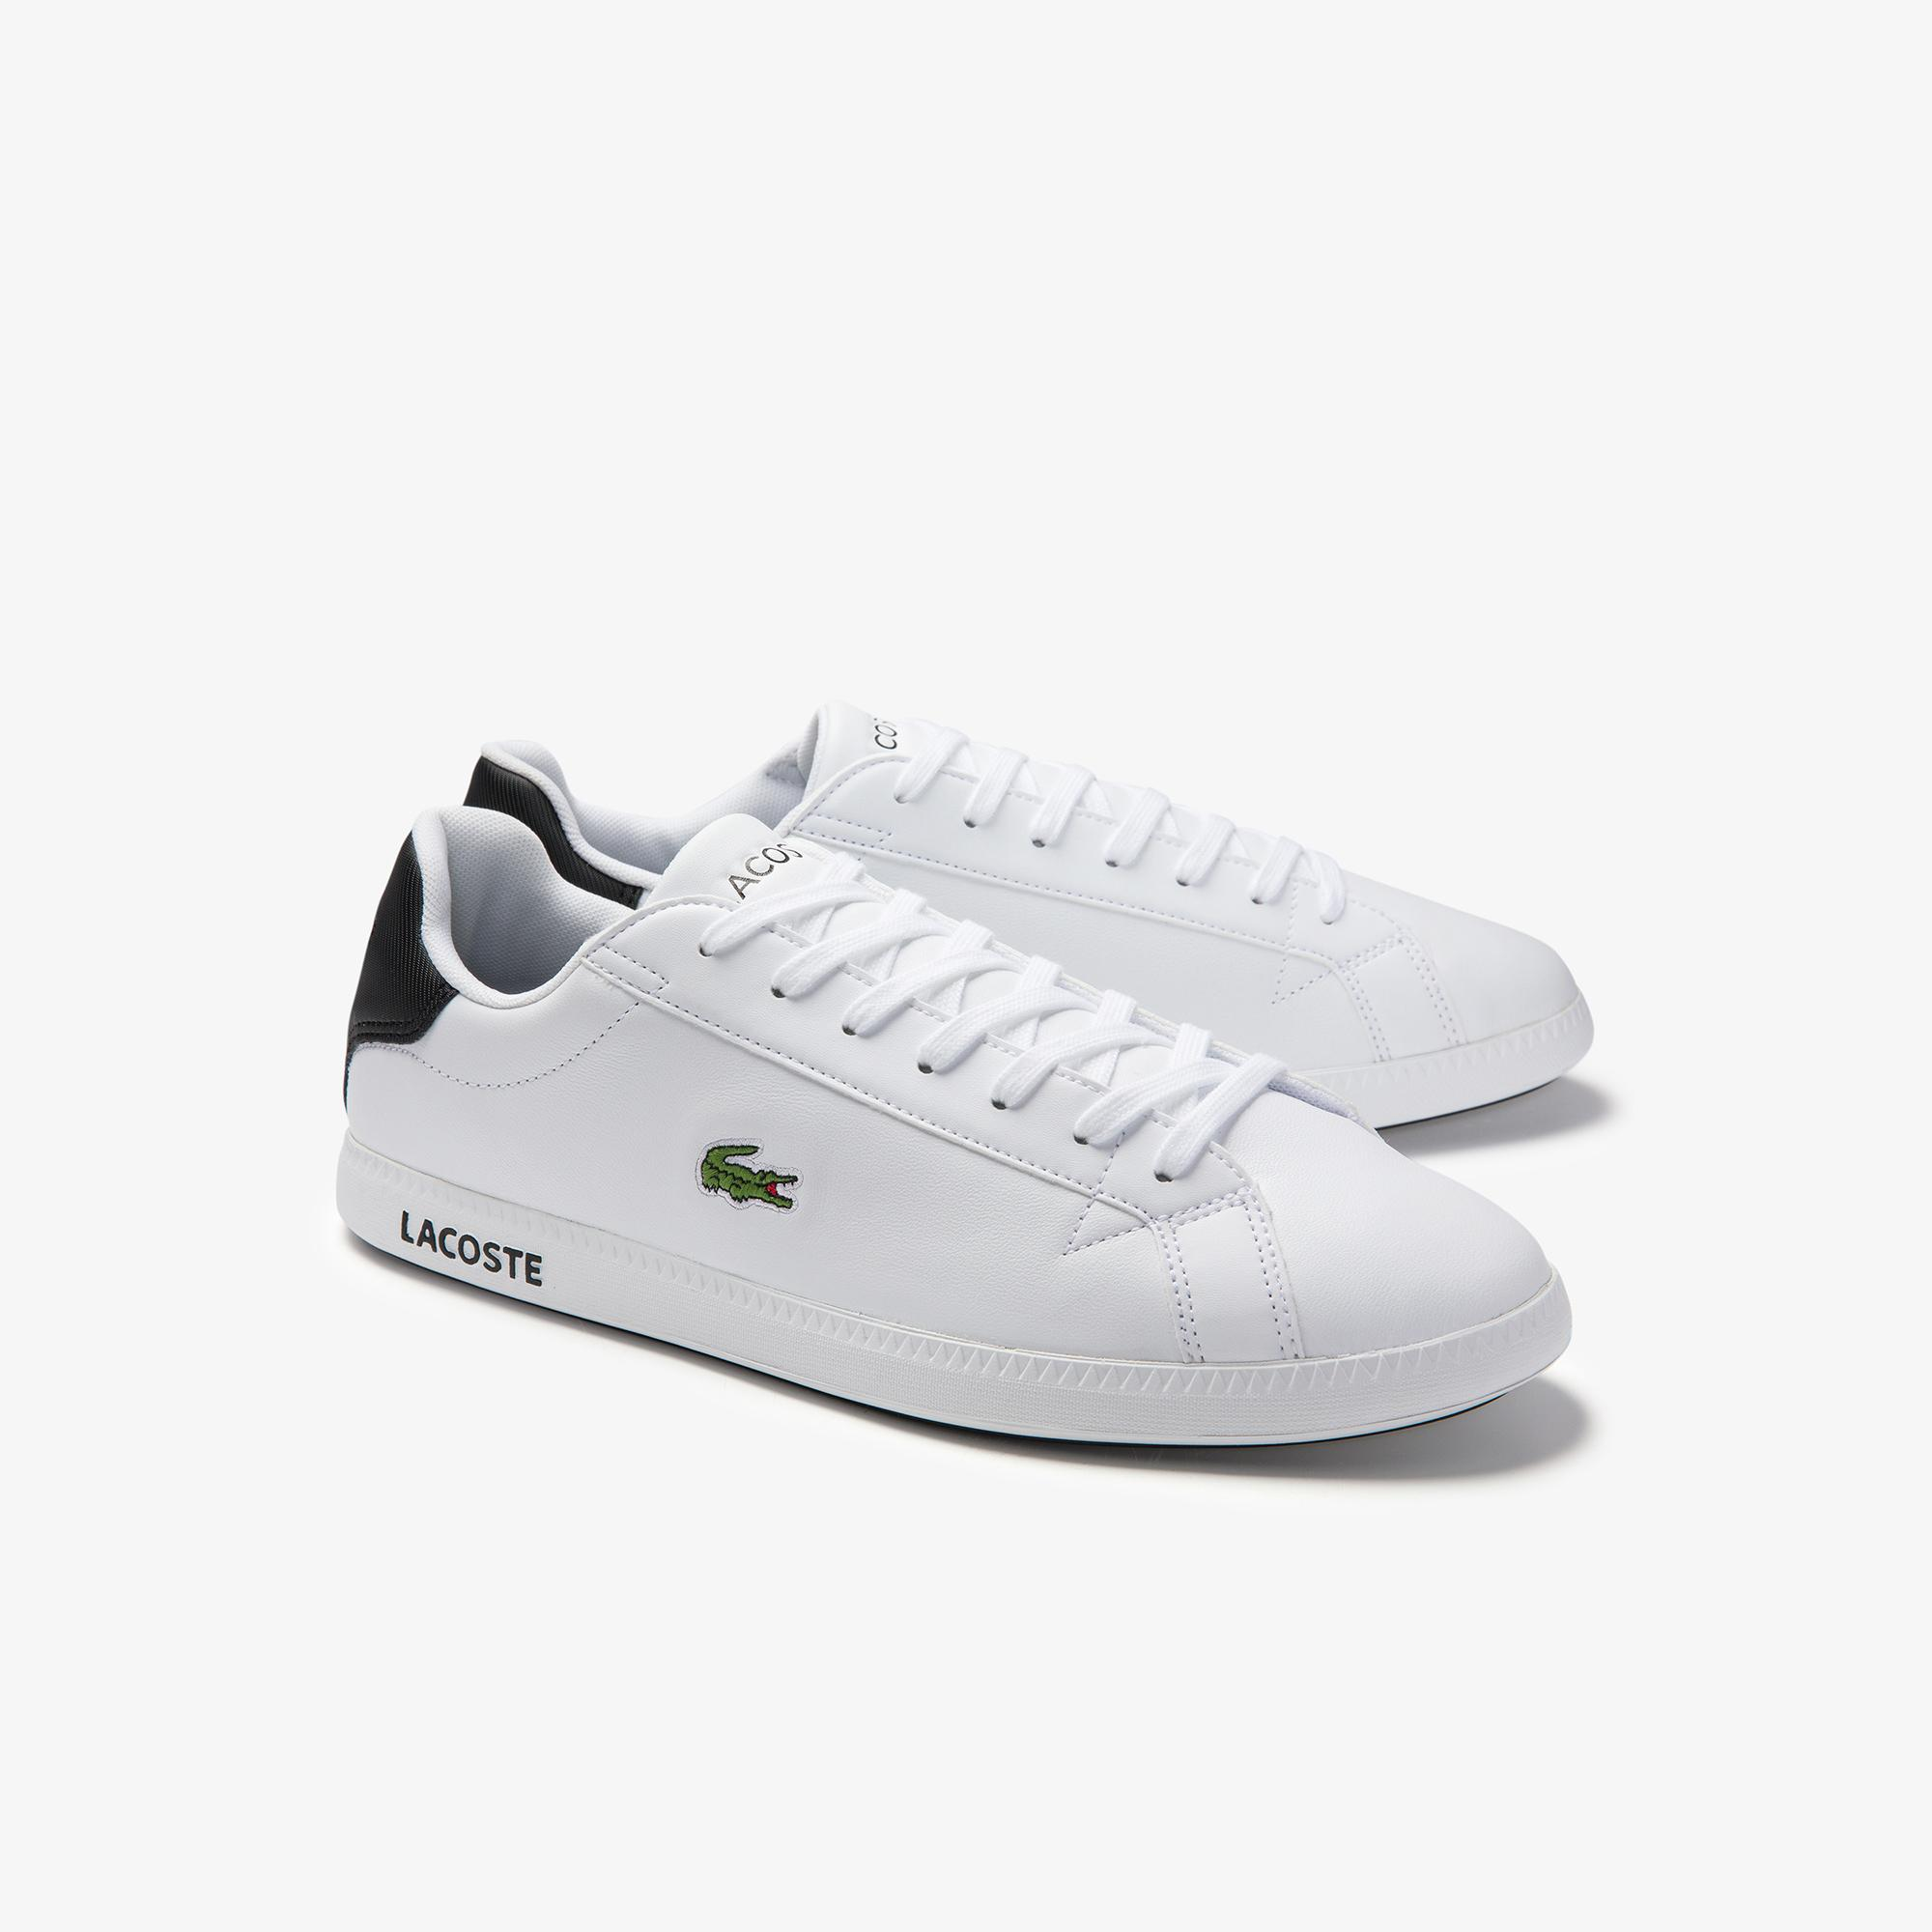 Lacoste Graduate 0120 2 Sma Erkek Beyaz - Siyah Sneaker